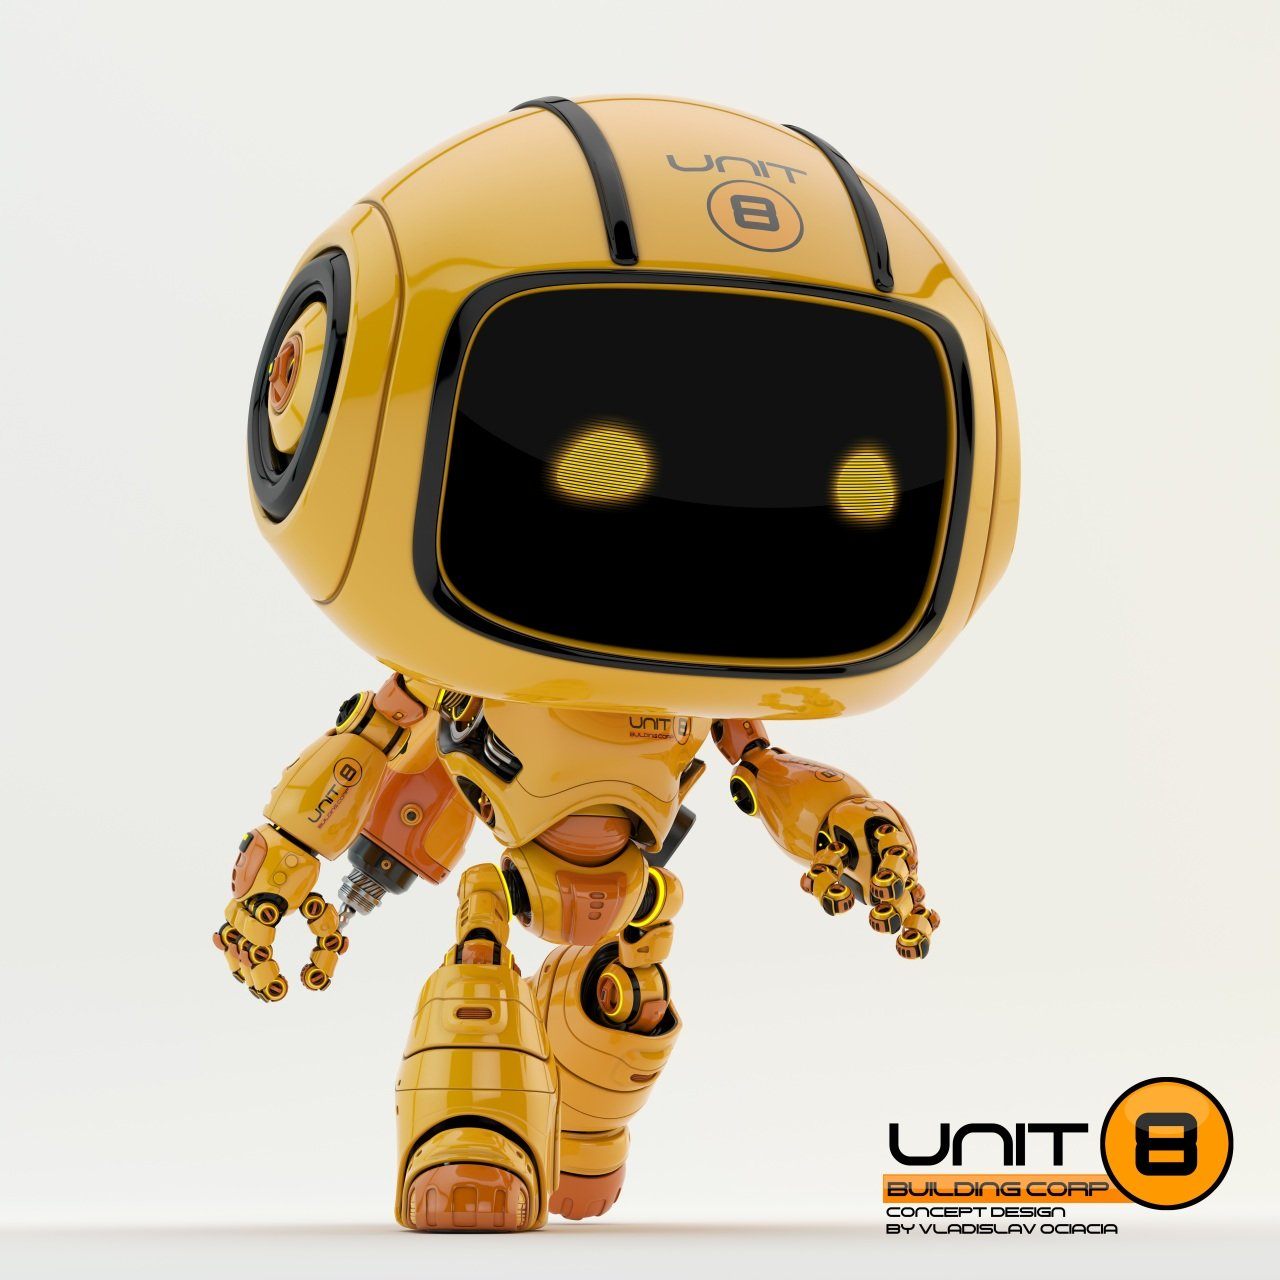 Vladislav ociacia team robot 11